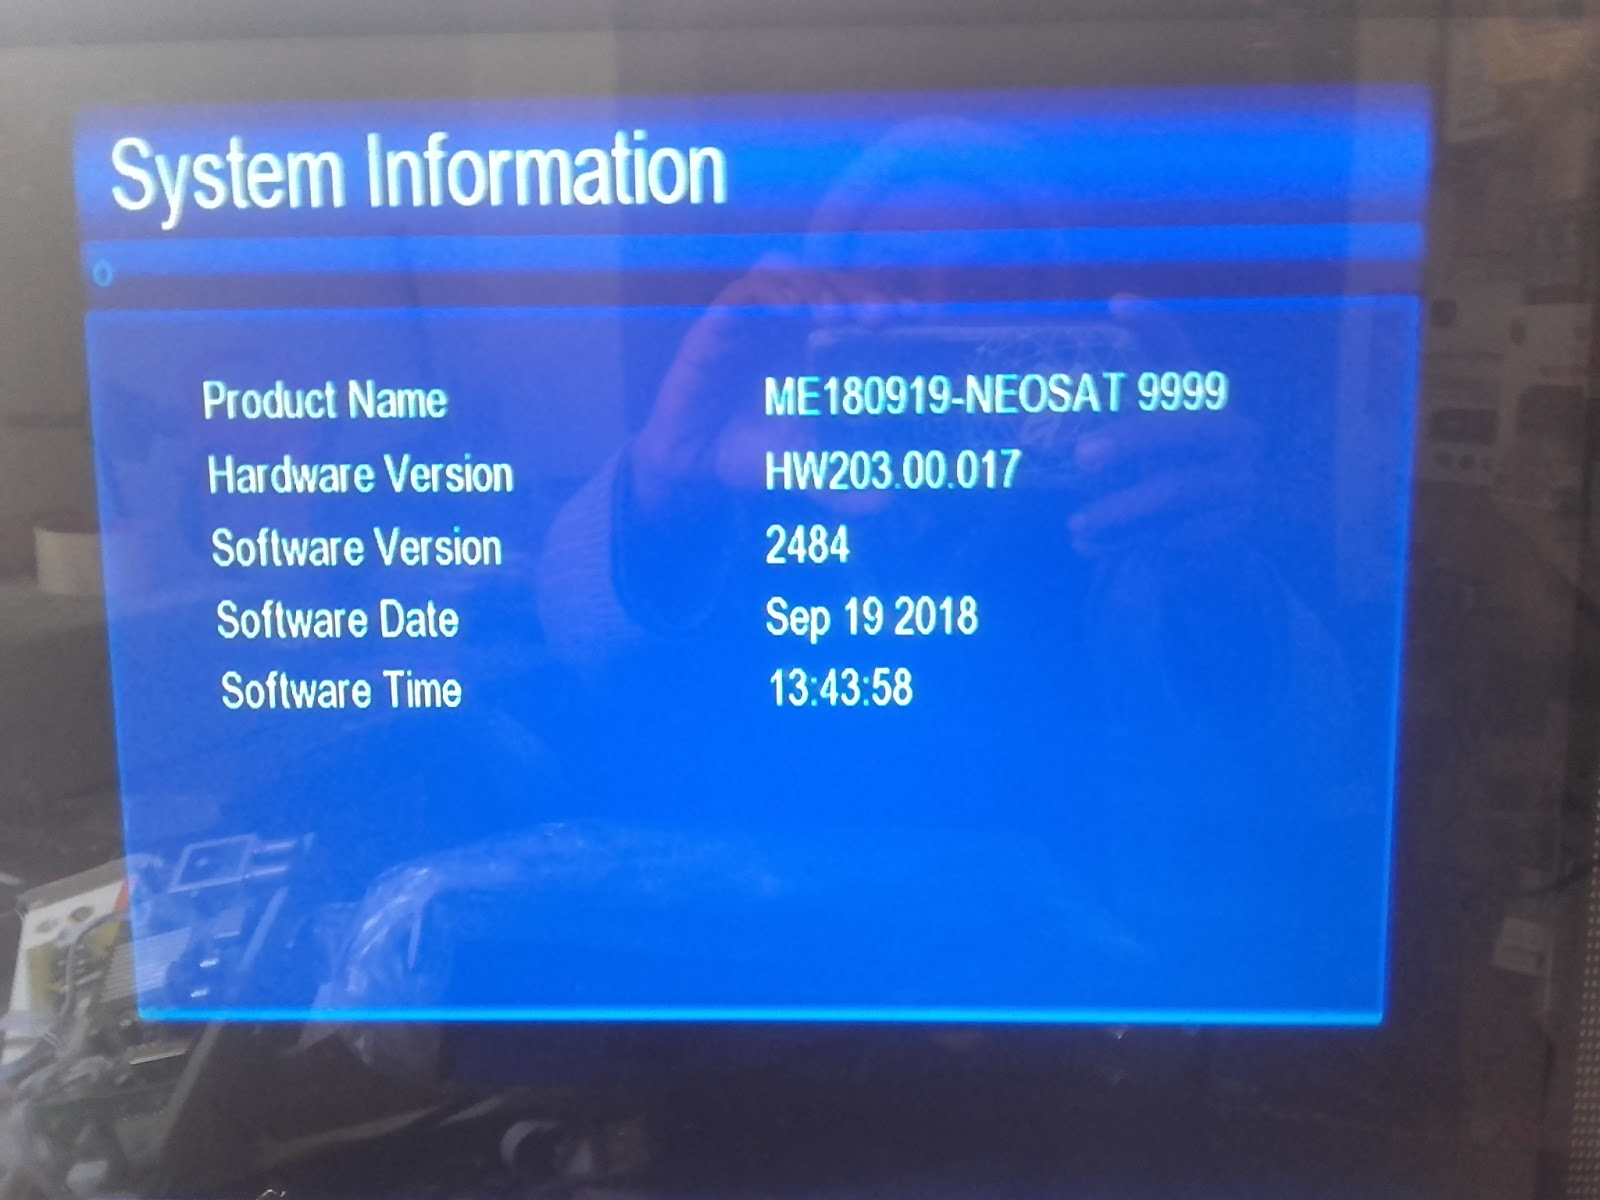 Gx6605s Firmware 2019